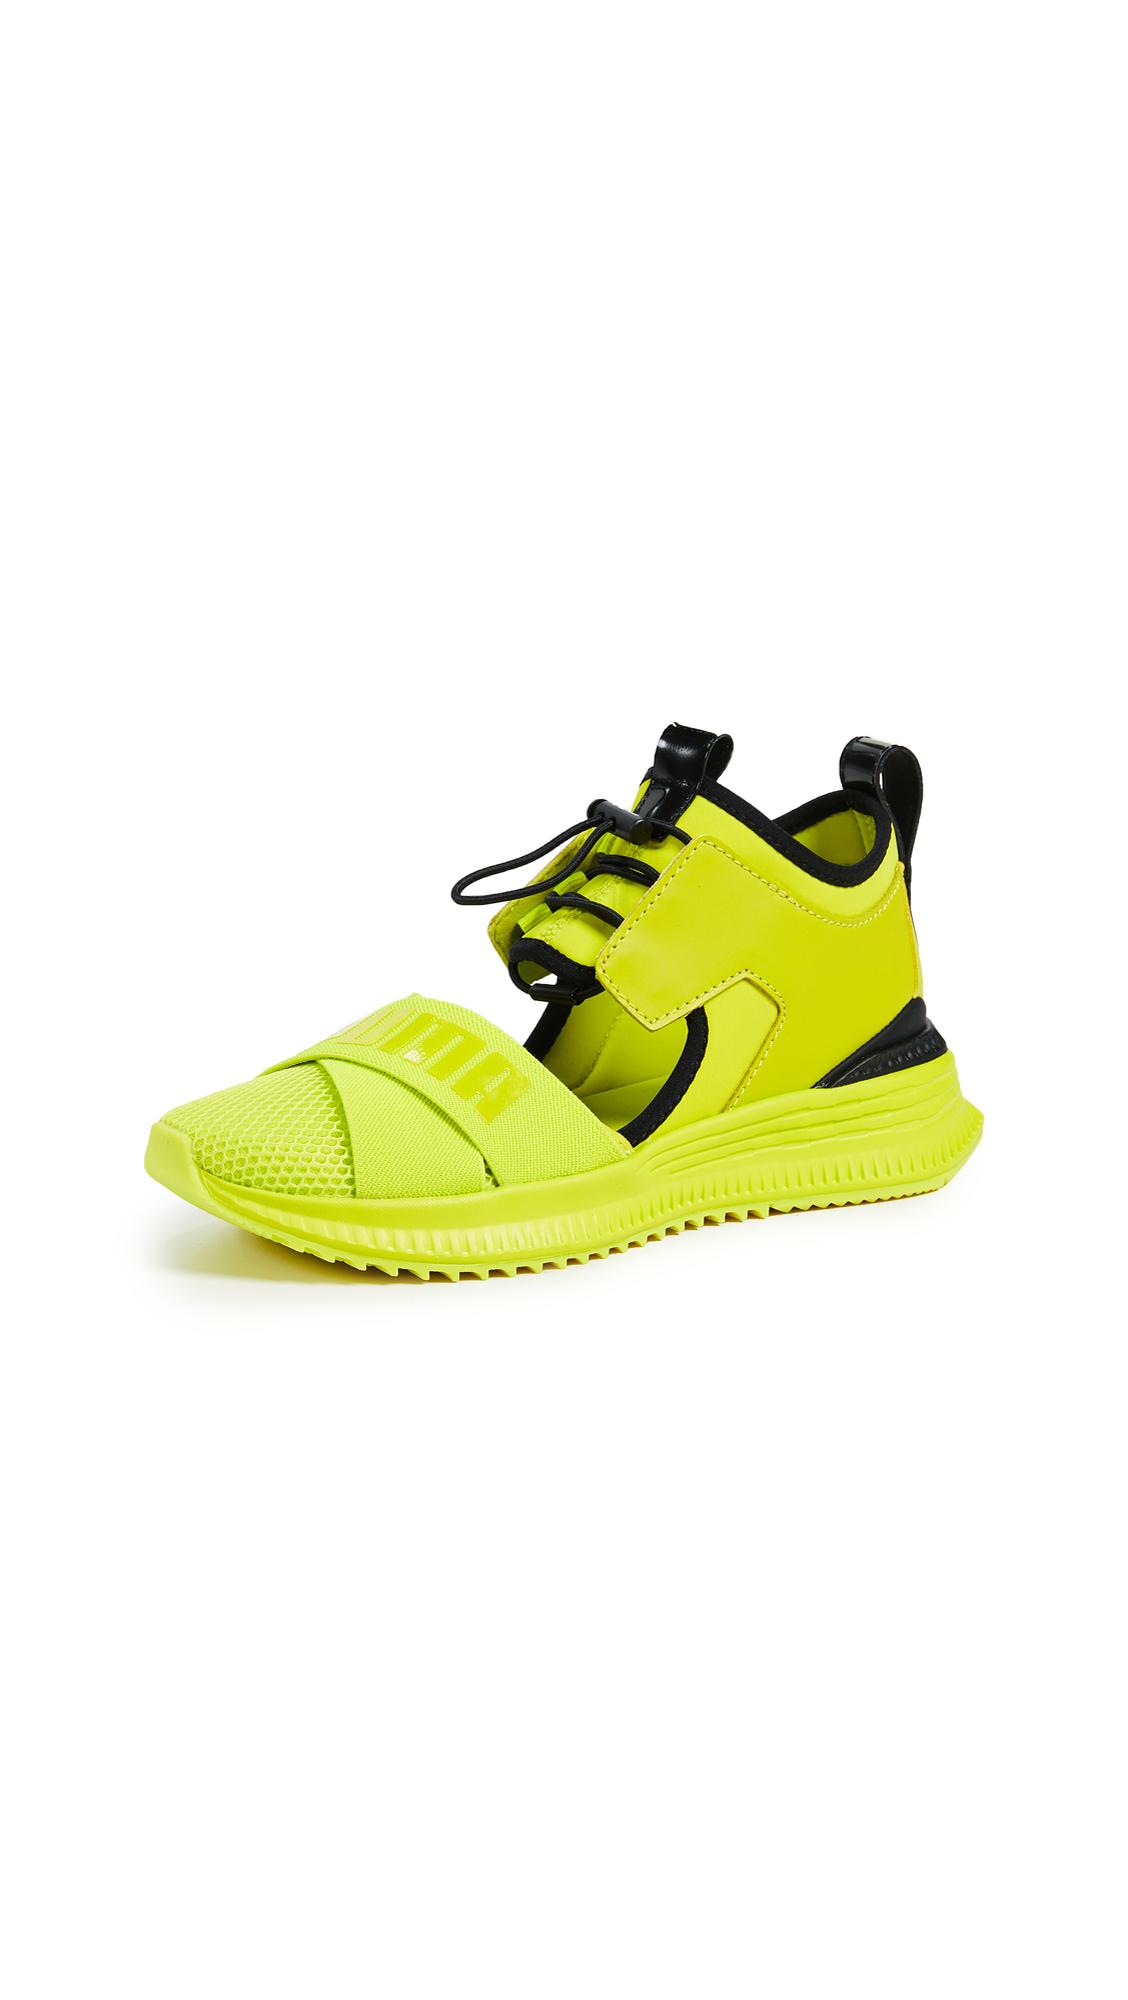 PUMA x FENTY Avid Sneakers - Limepunch/Puma Black